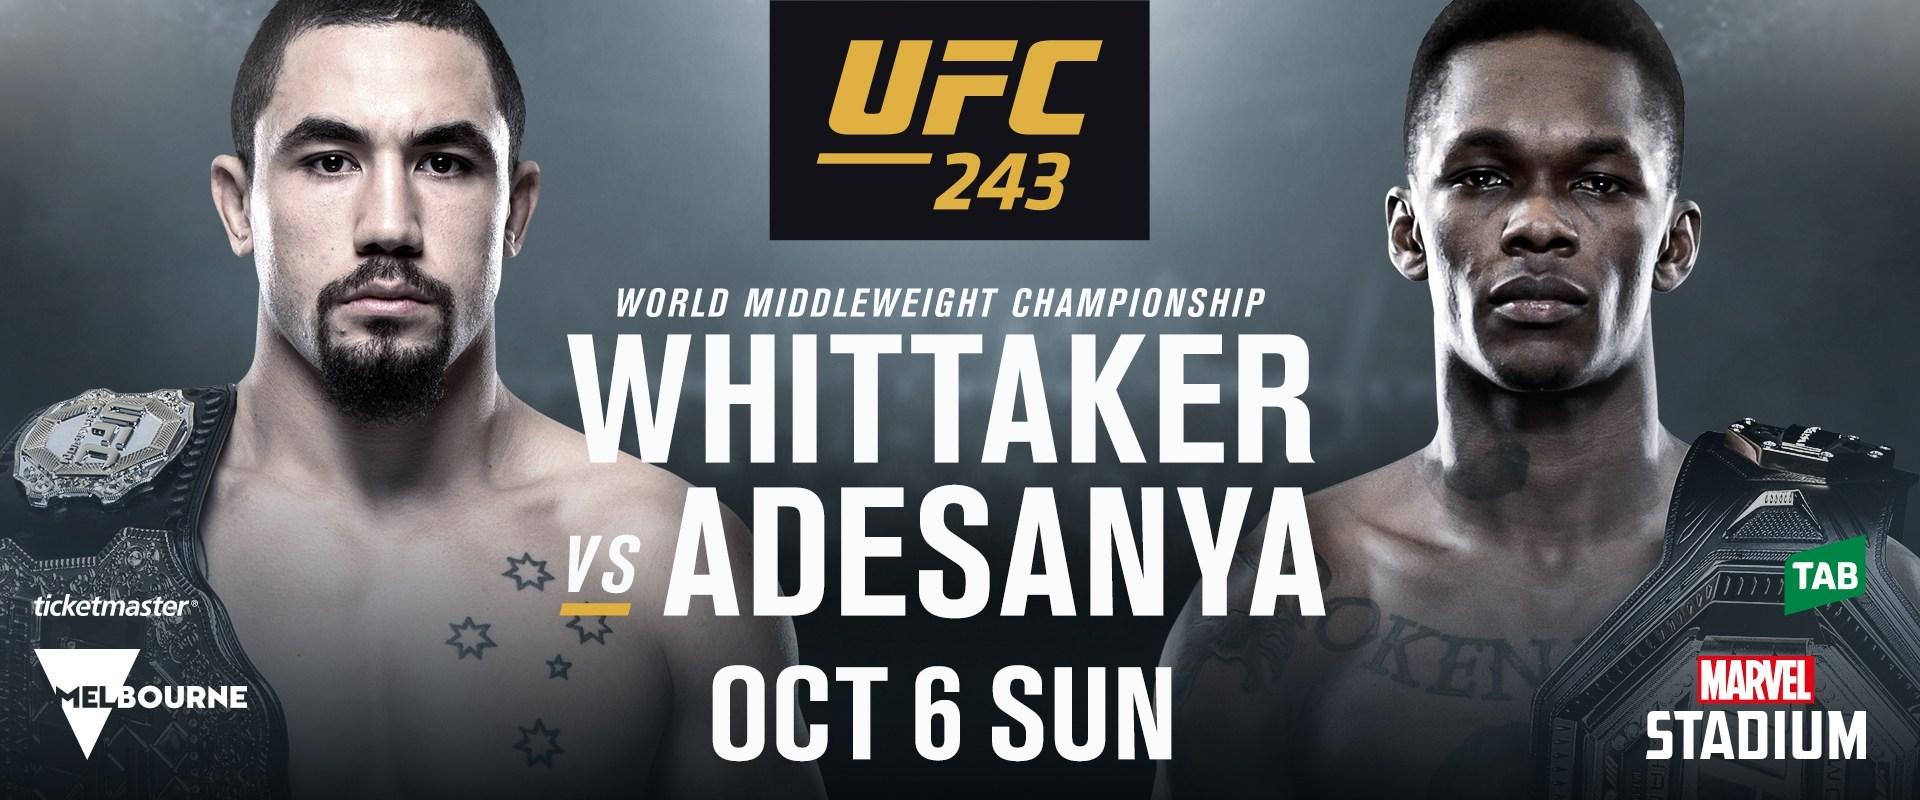 UFC243.jpg